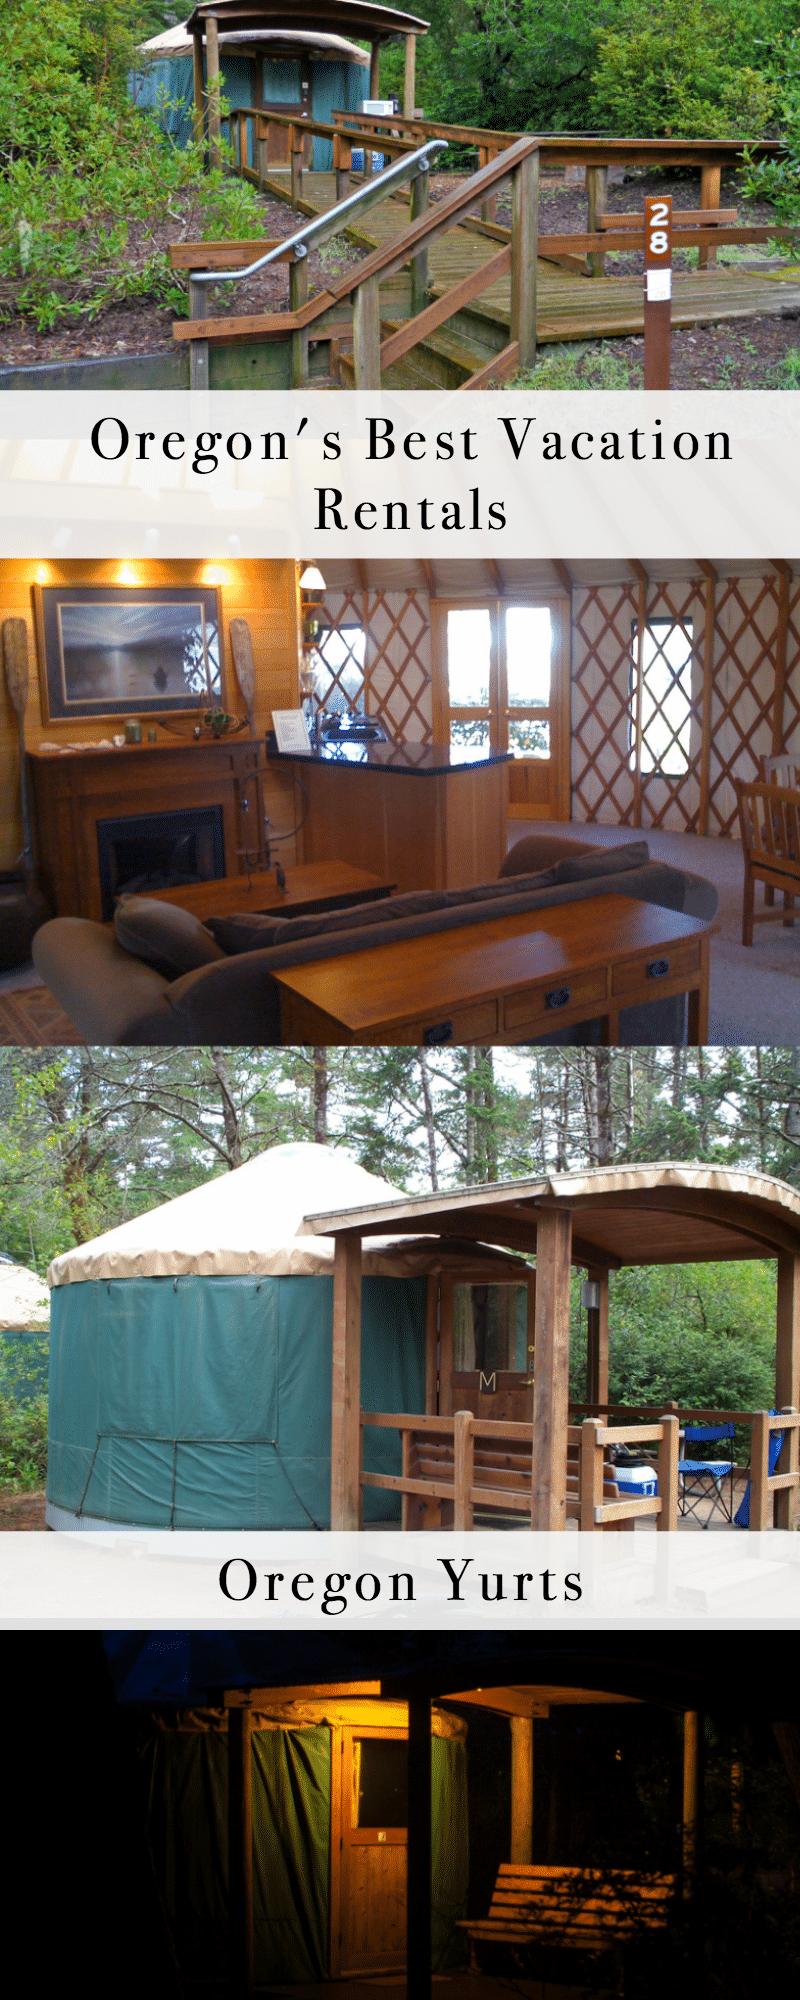 Oregon's Best Vacation Rentals: Oregon Yurts